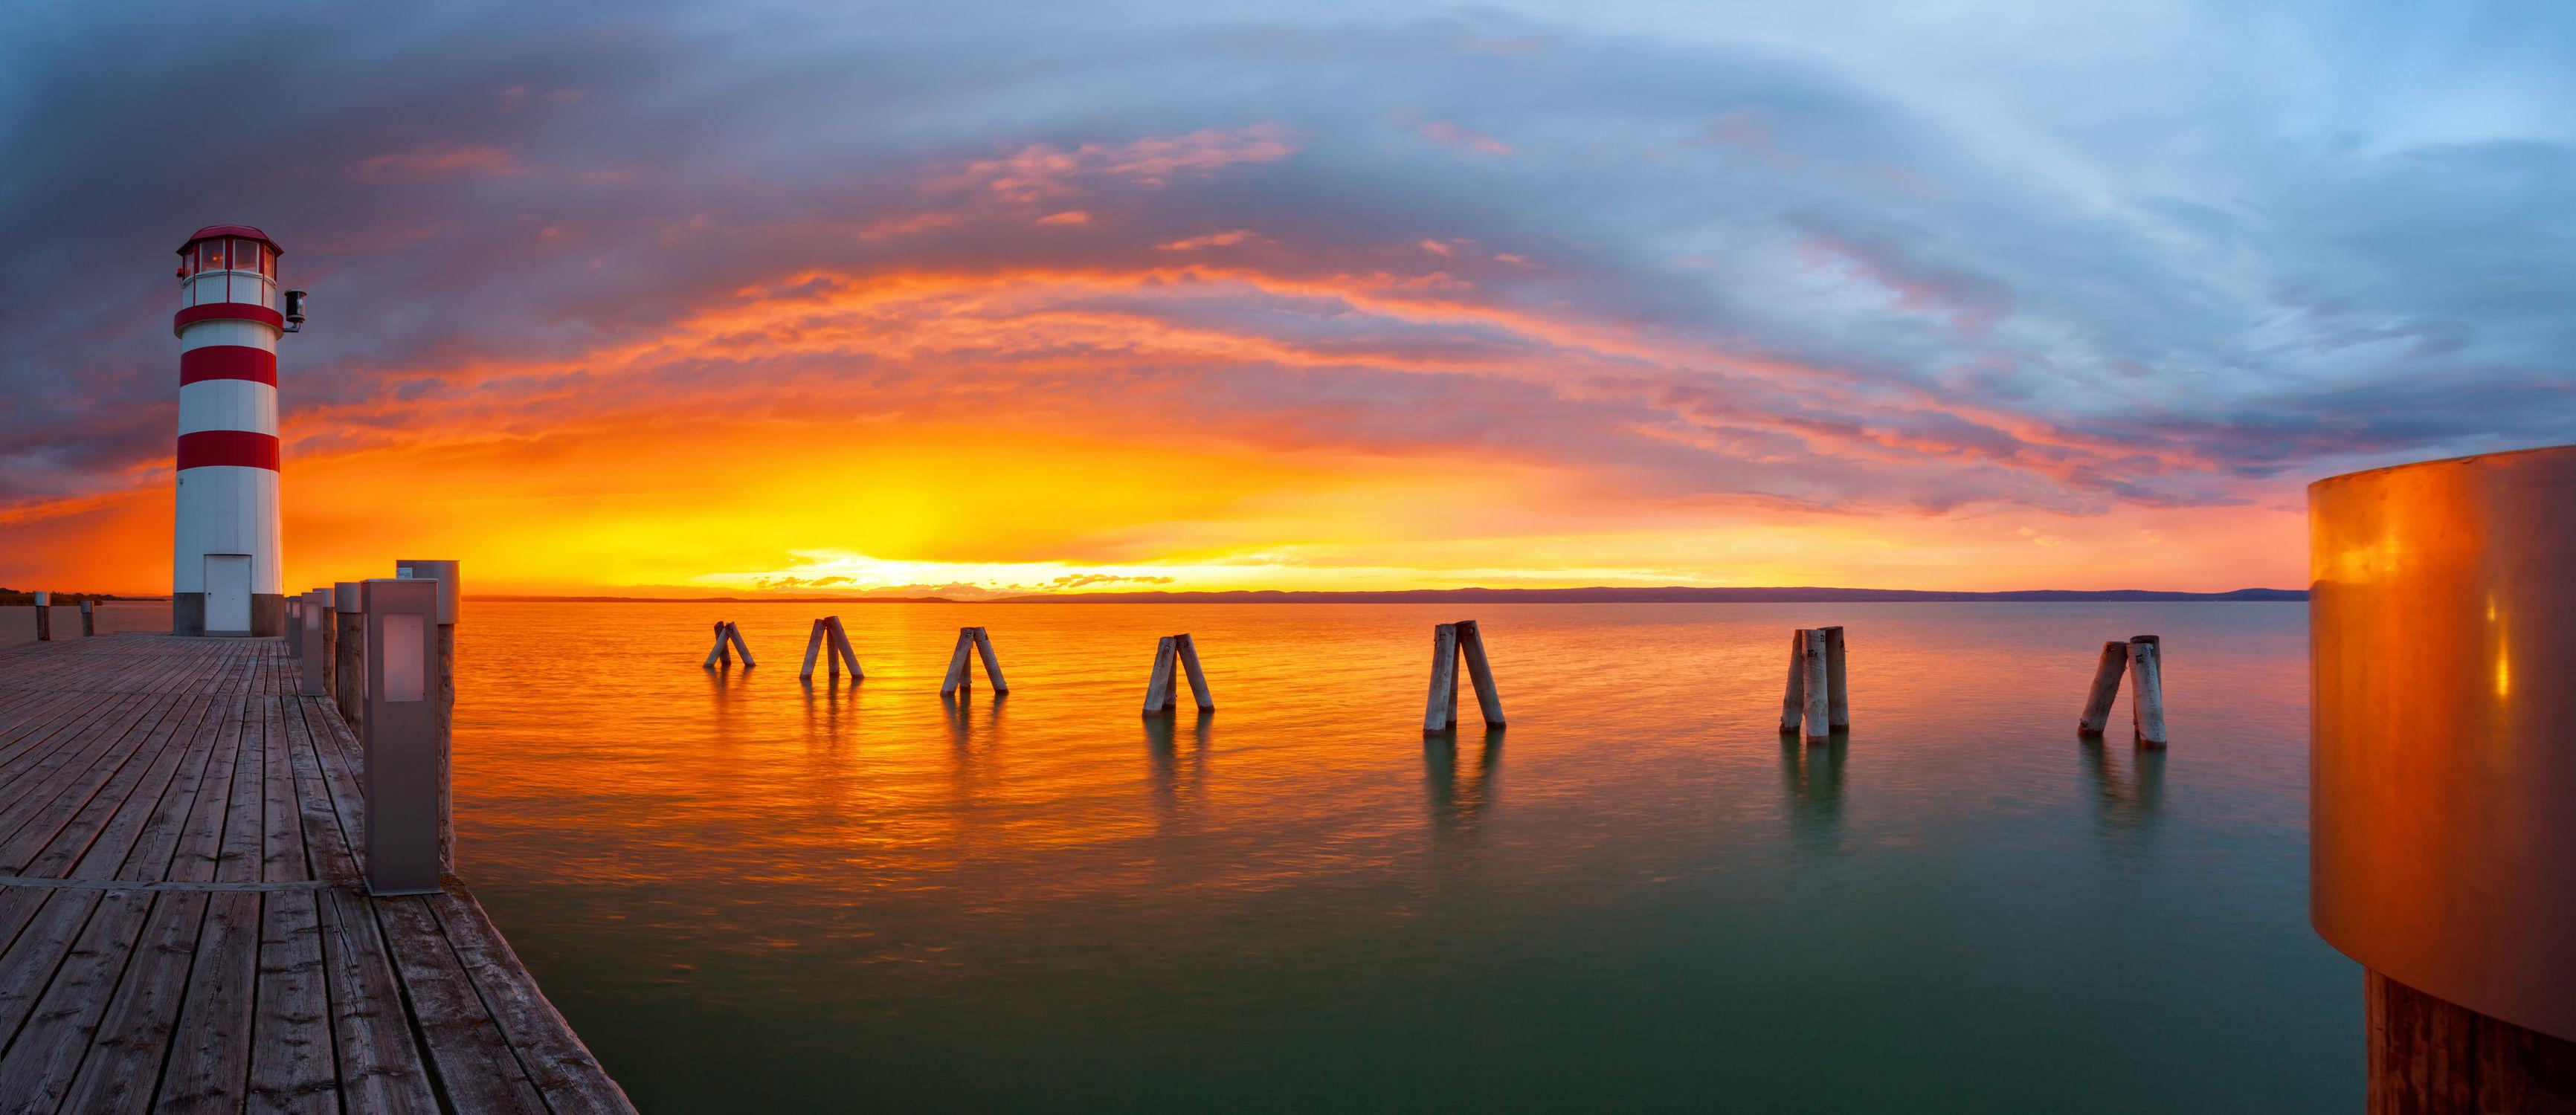 Bild mit Natur, Wasser, Gewässer, Wellen, Sonnenuntergang, Sonnenaufgang, Steg, Am Meer, Leuchtturm, ozean